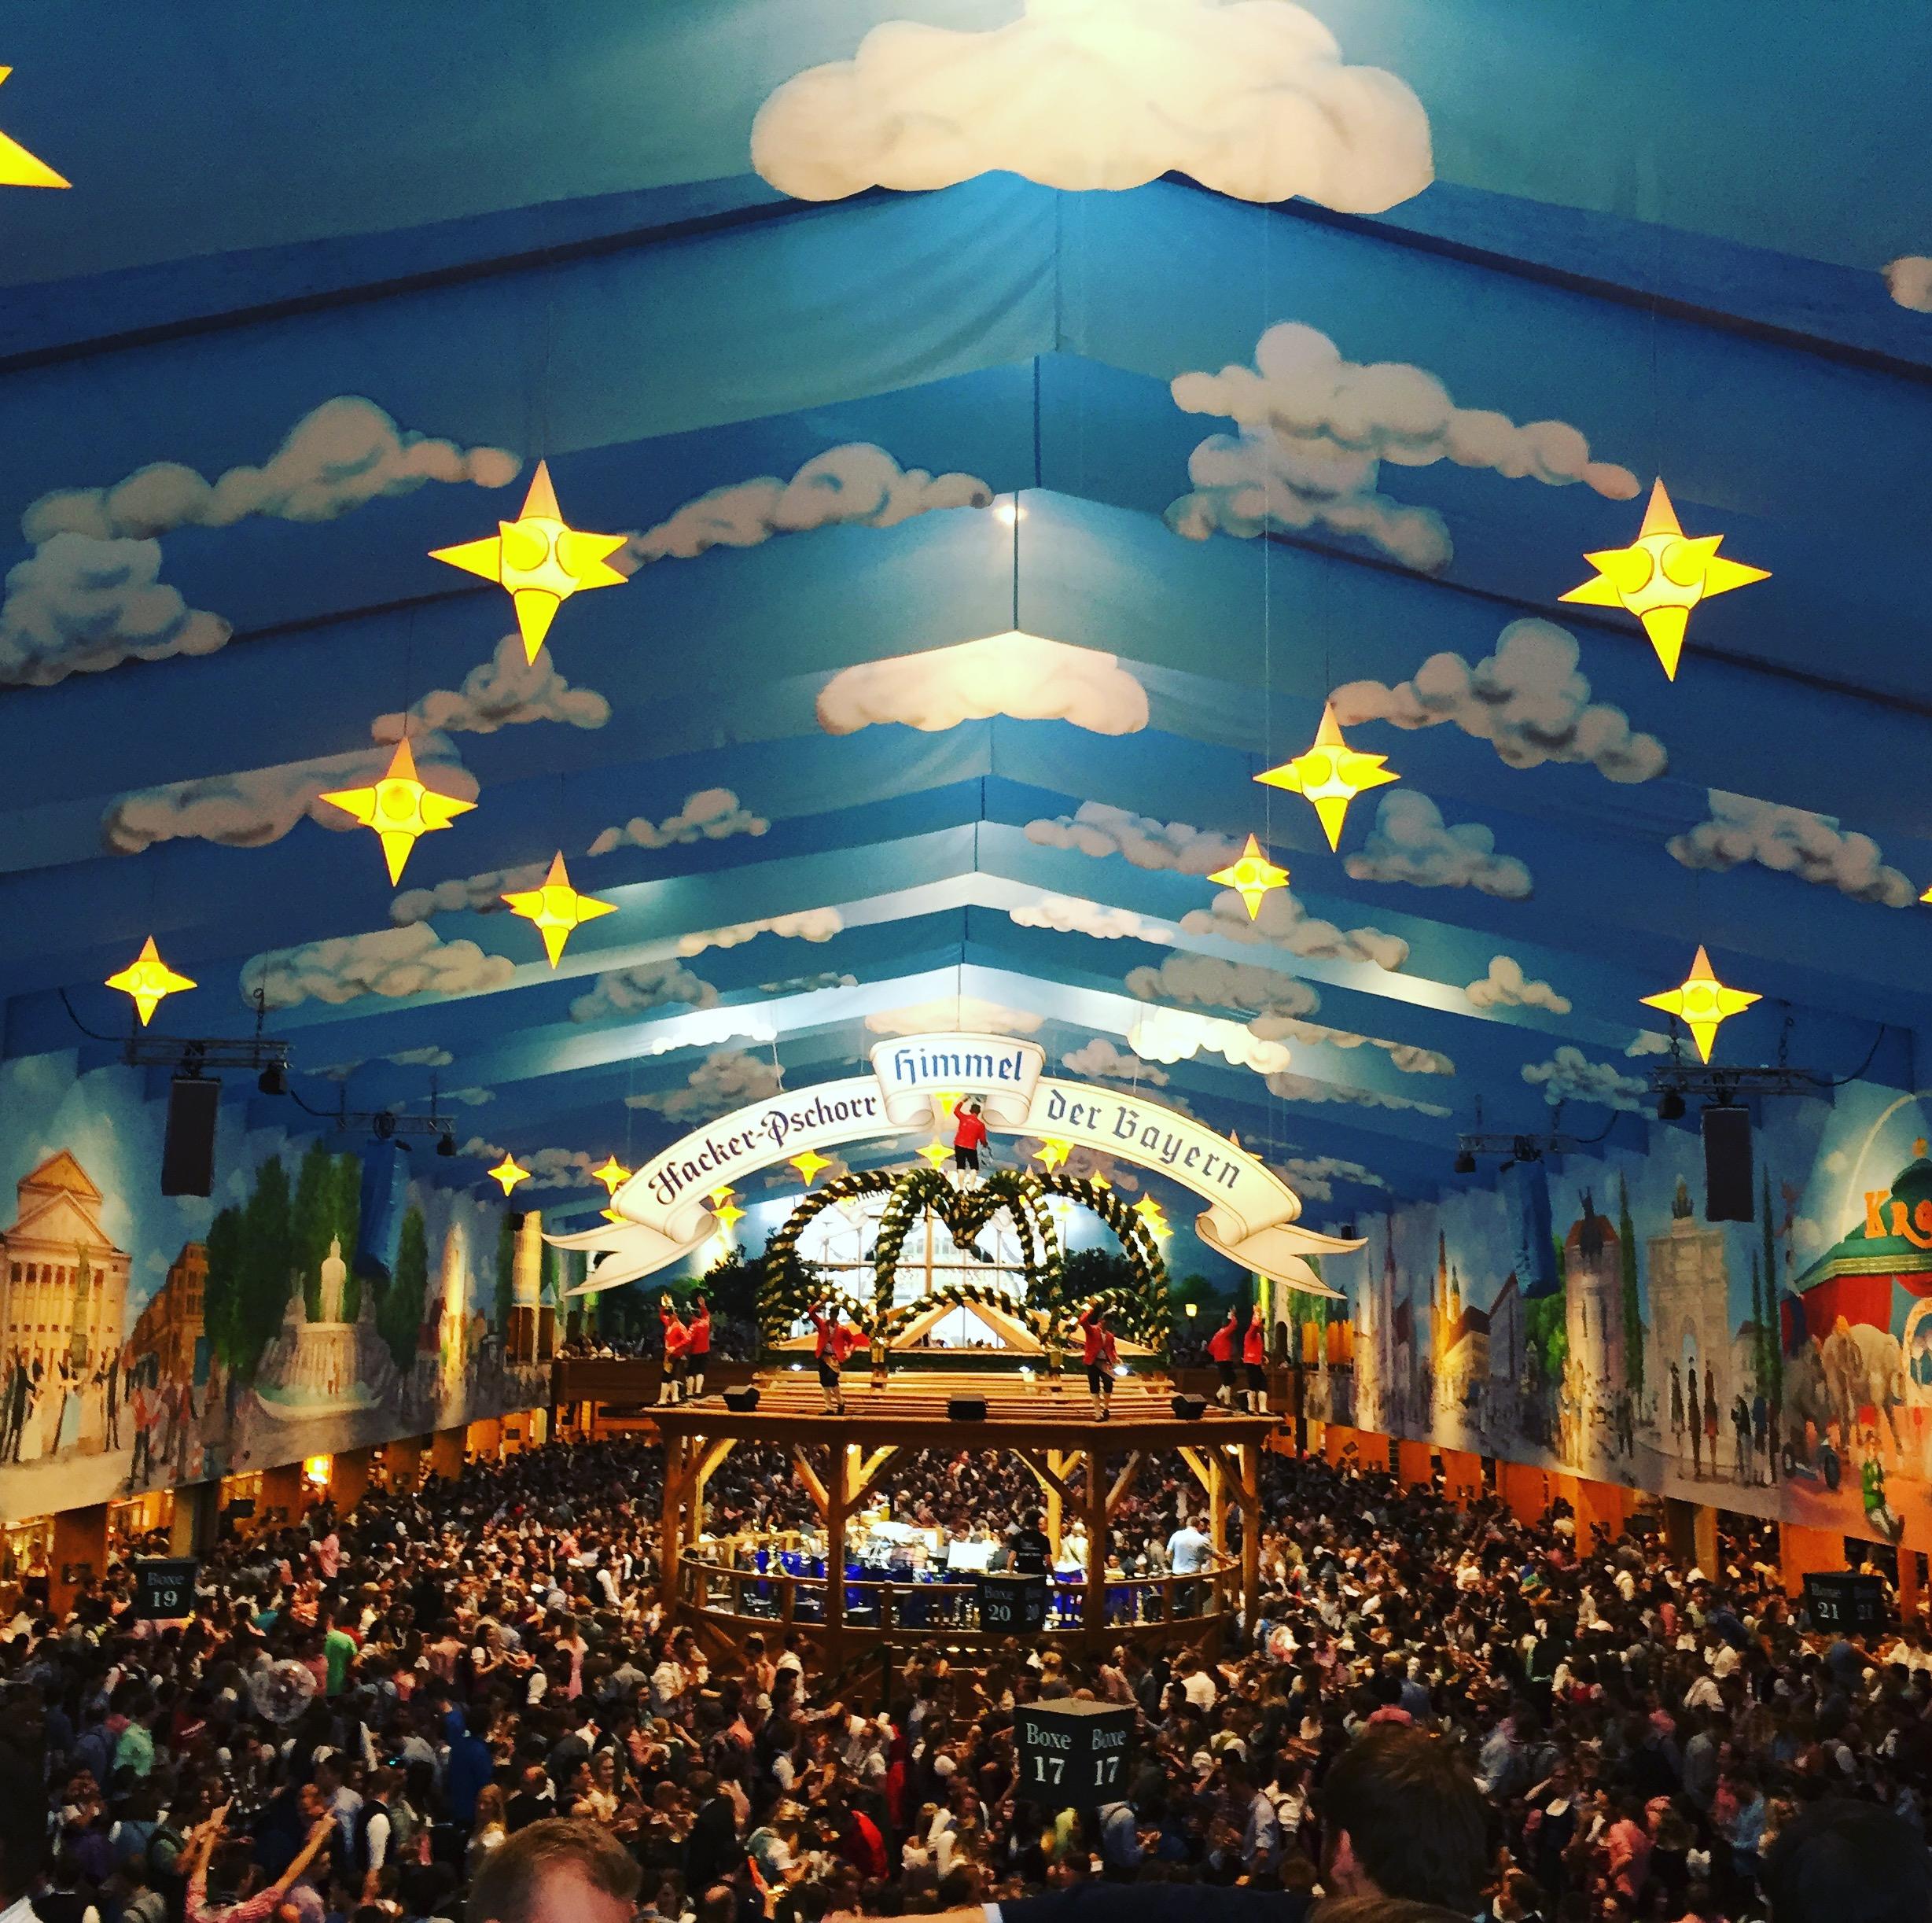 Hacker-Festhalle tent